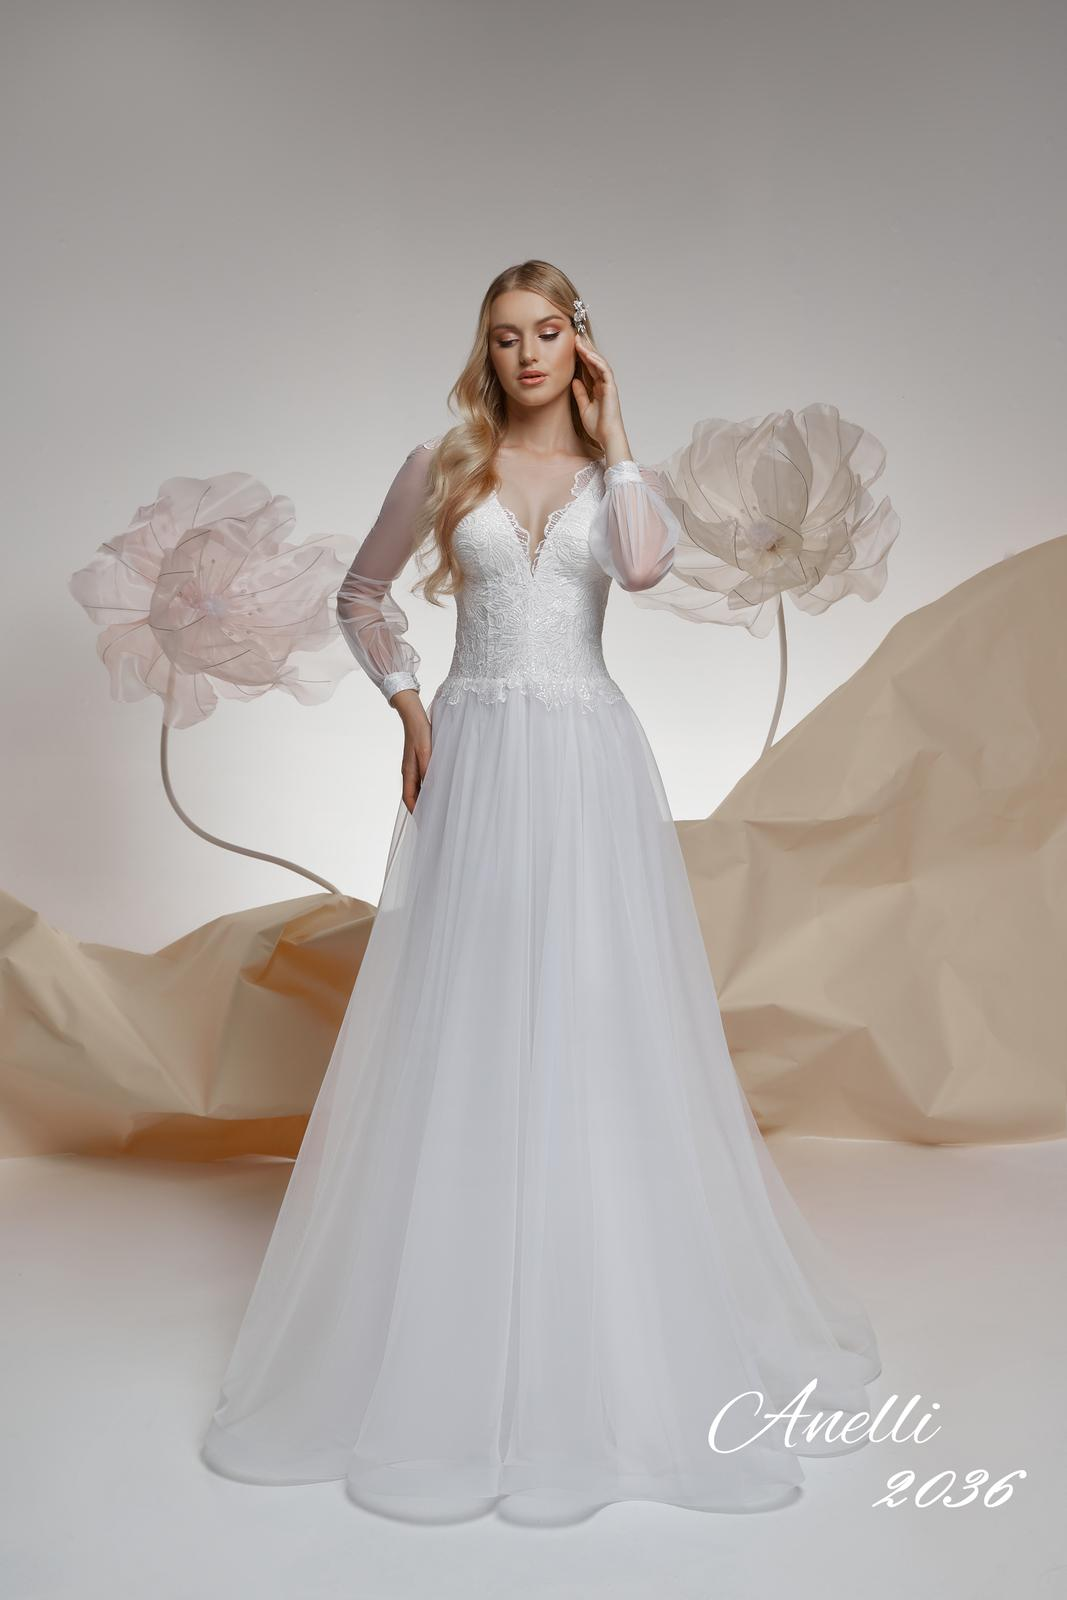 Svadobné šaty - Imagine 2036 - Obrázok č. 1